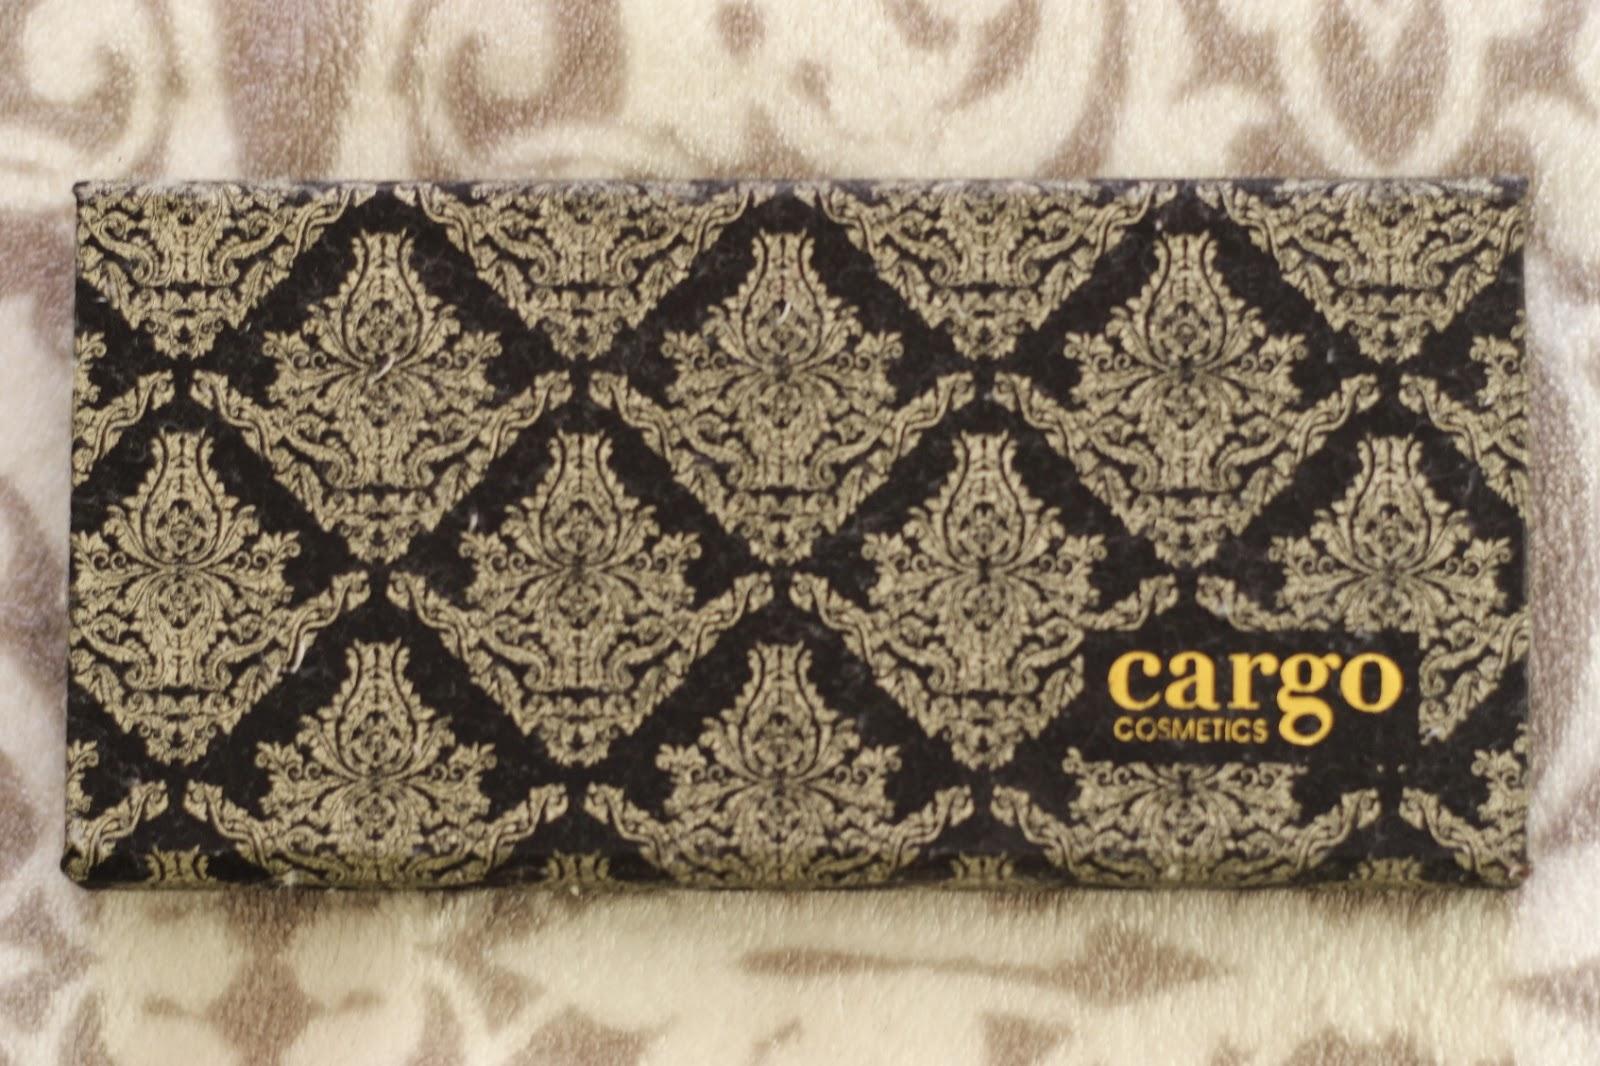 Cargo Cosmetics Let's Meet In Paris Eyeshadow Palette Review